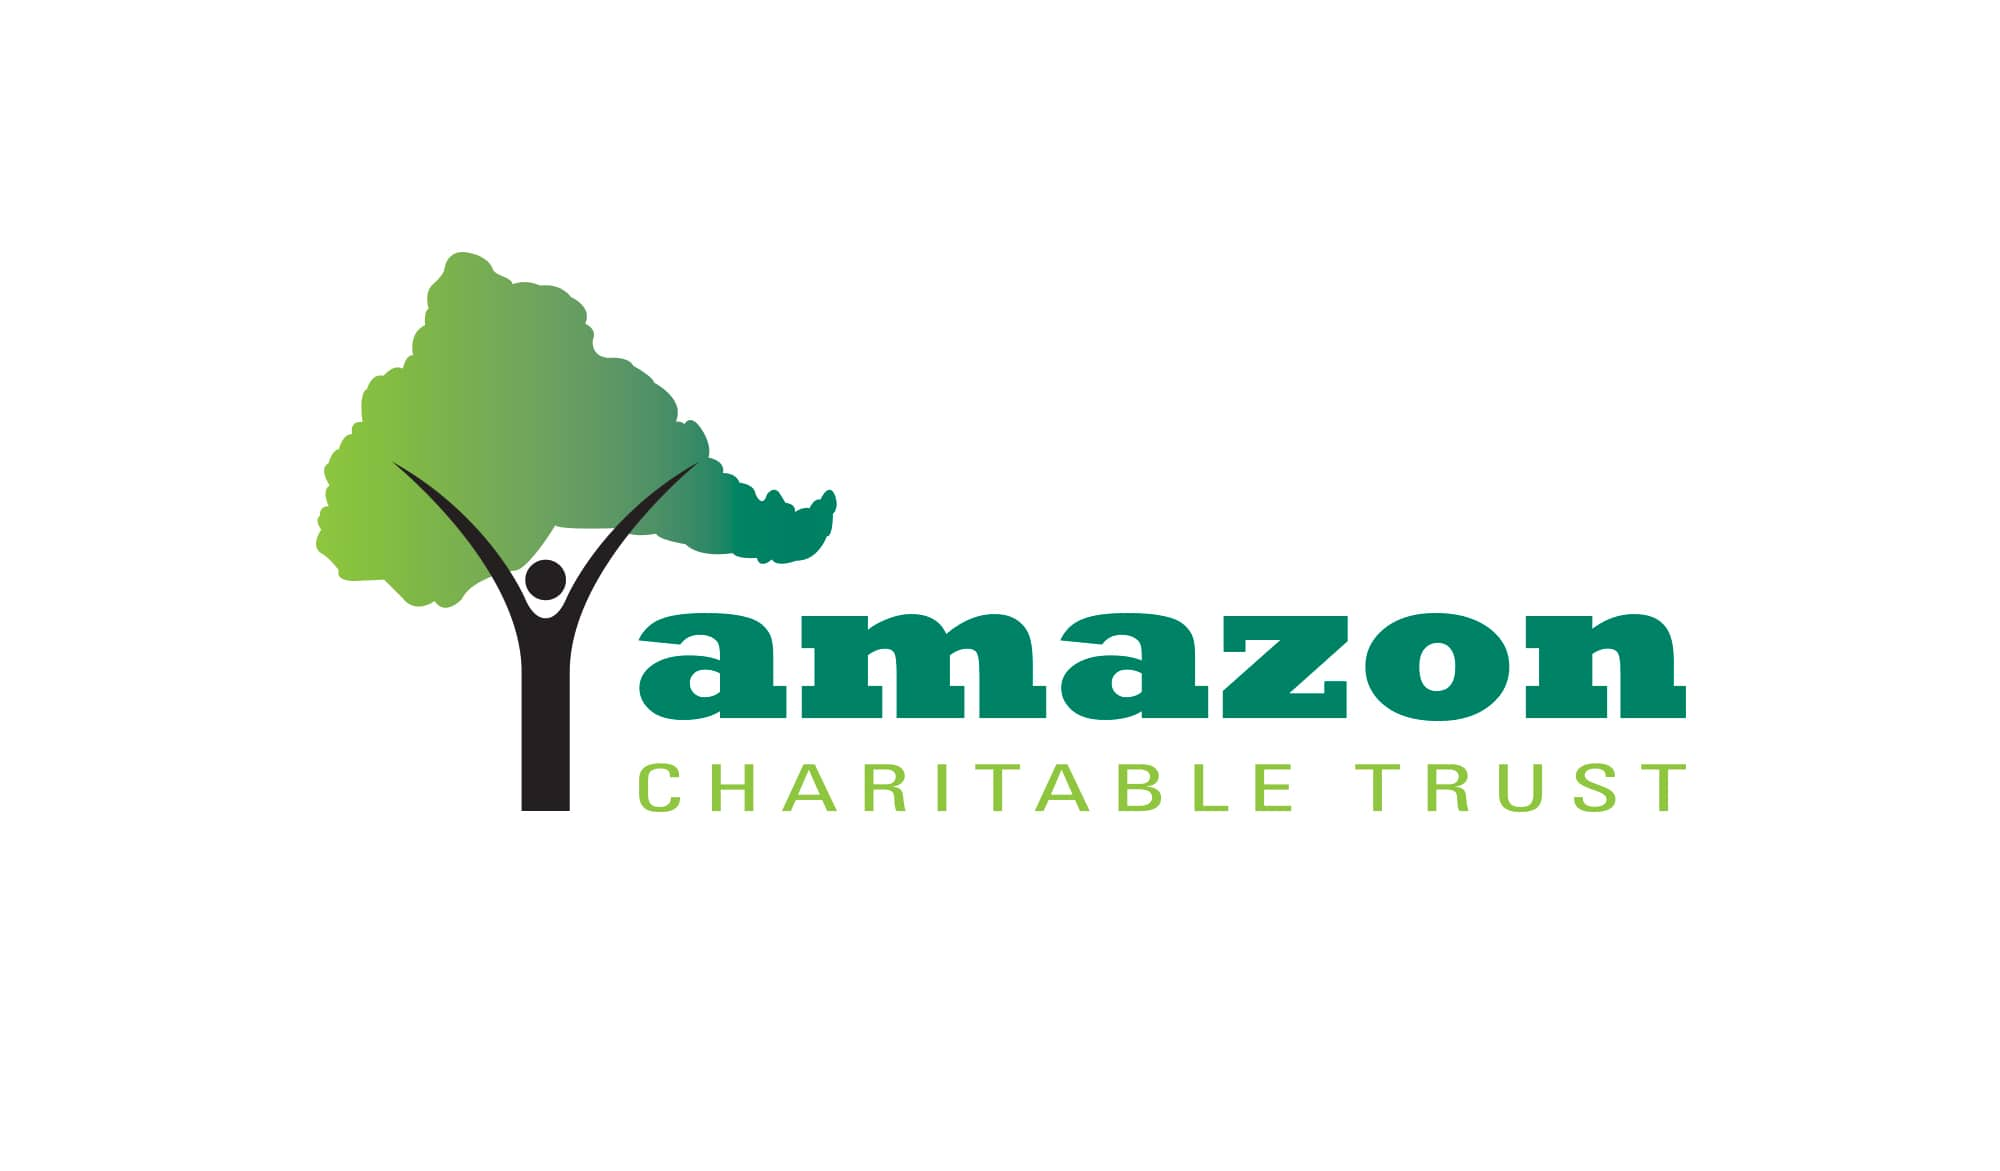 Amazon Charitable Trust - logo